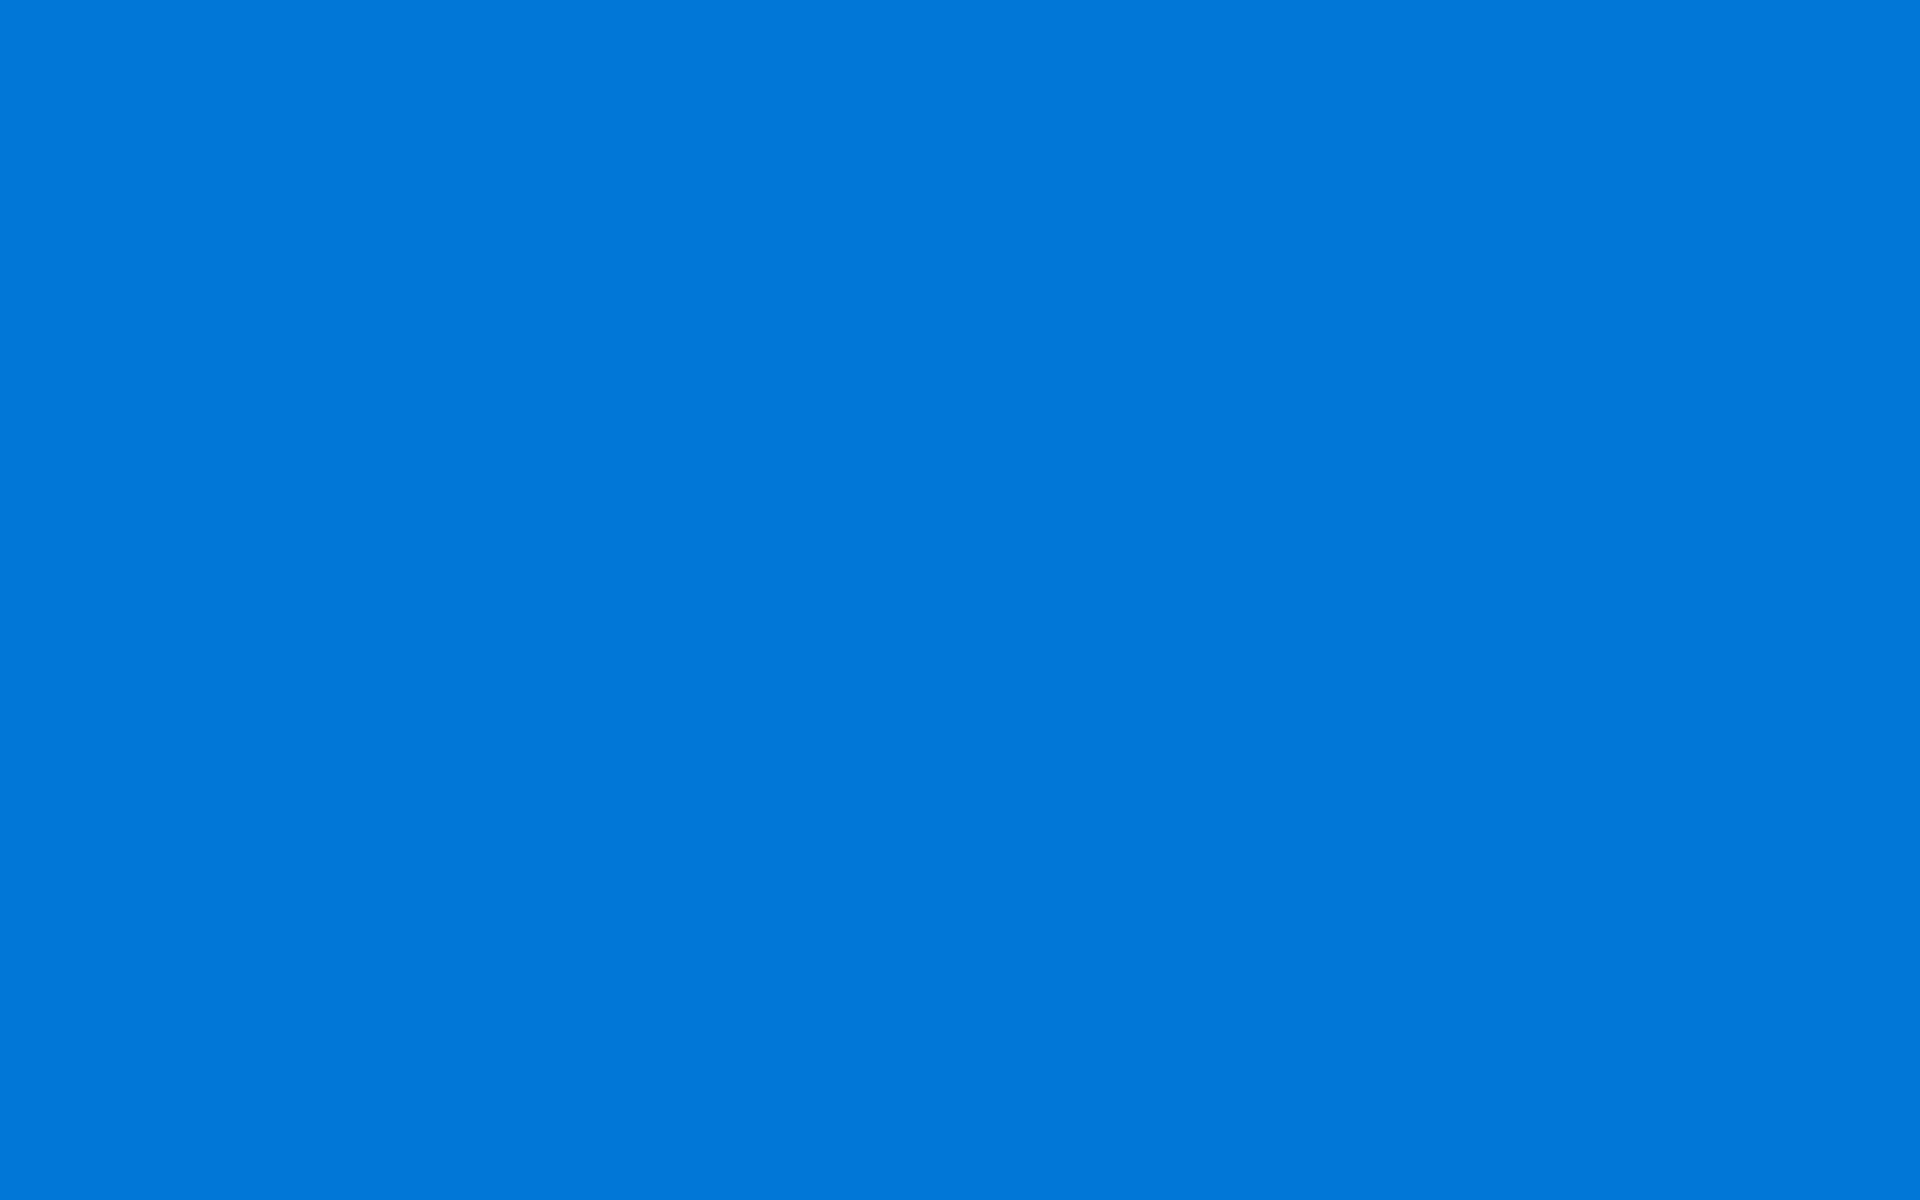 Windows plain blue background for computer